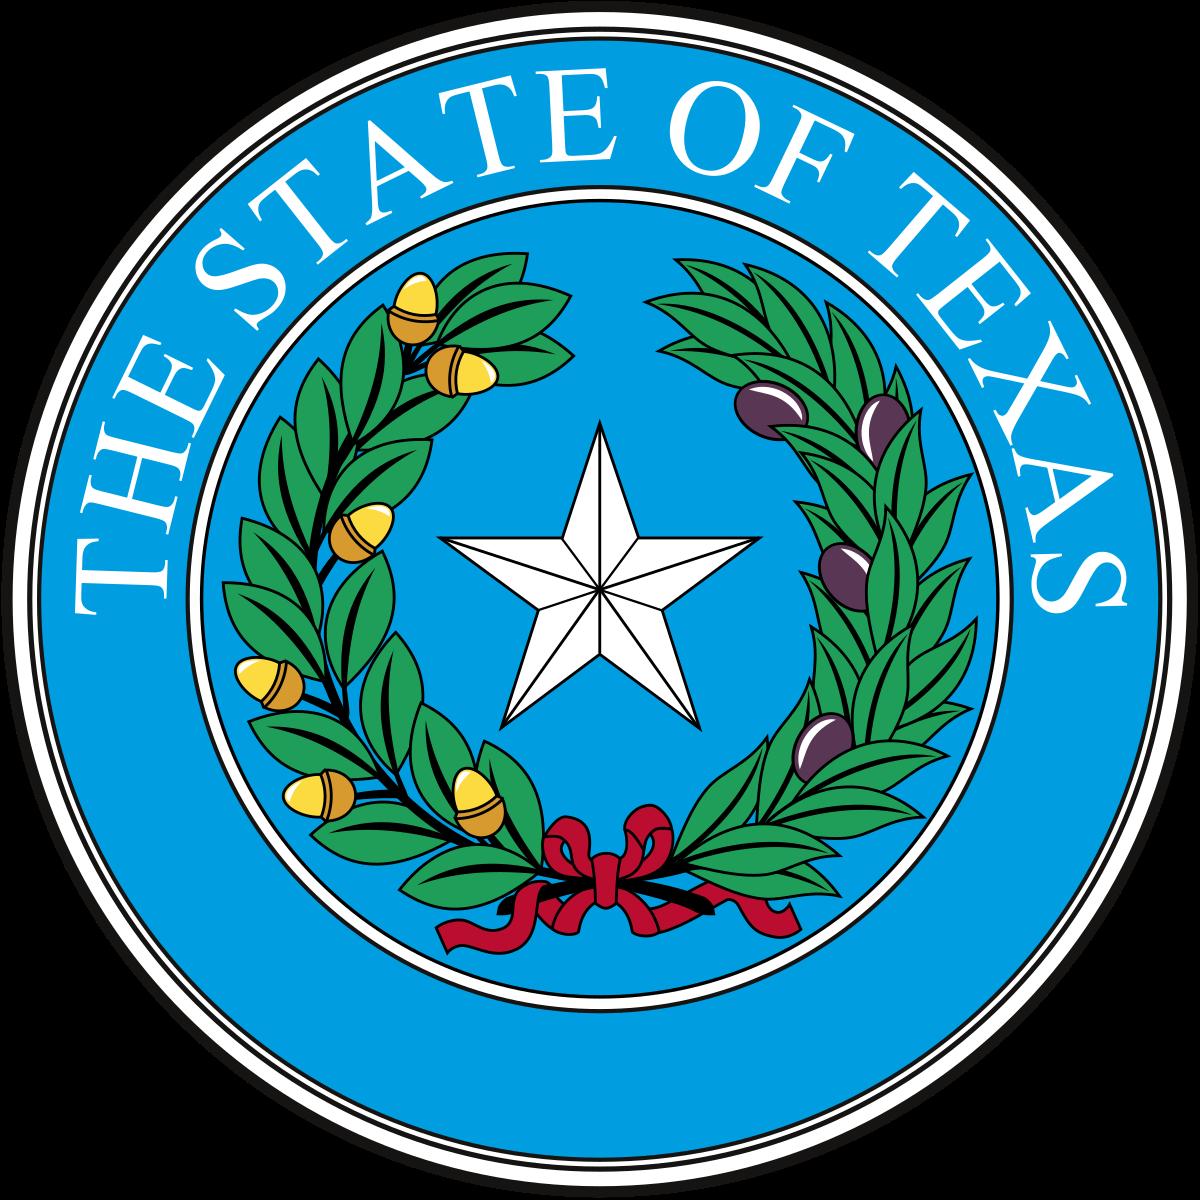 Texas Emergency Preparation Supplies Sales Tax Holiday (April 24 – 26, 2021)